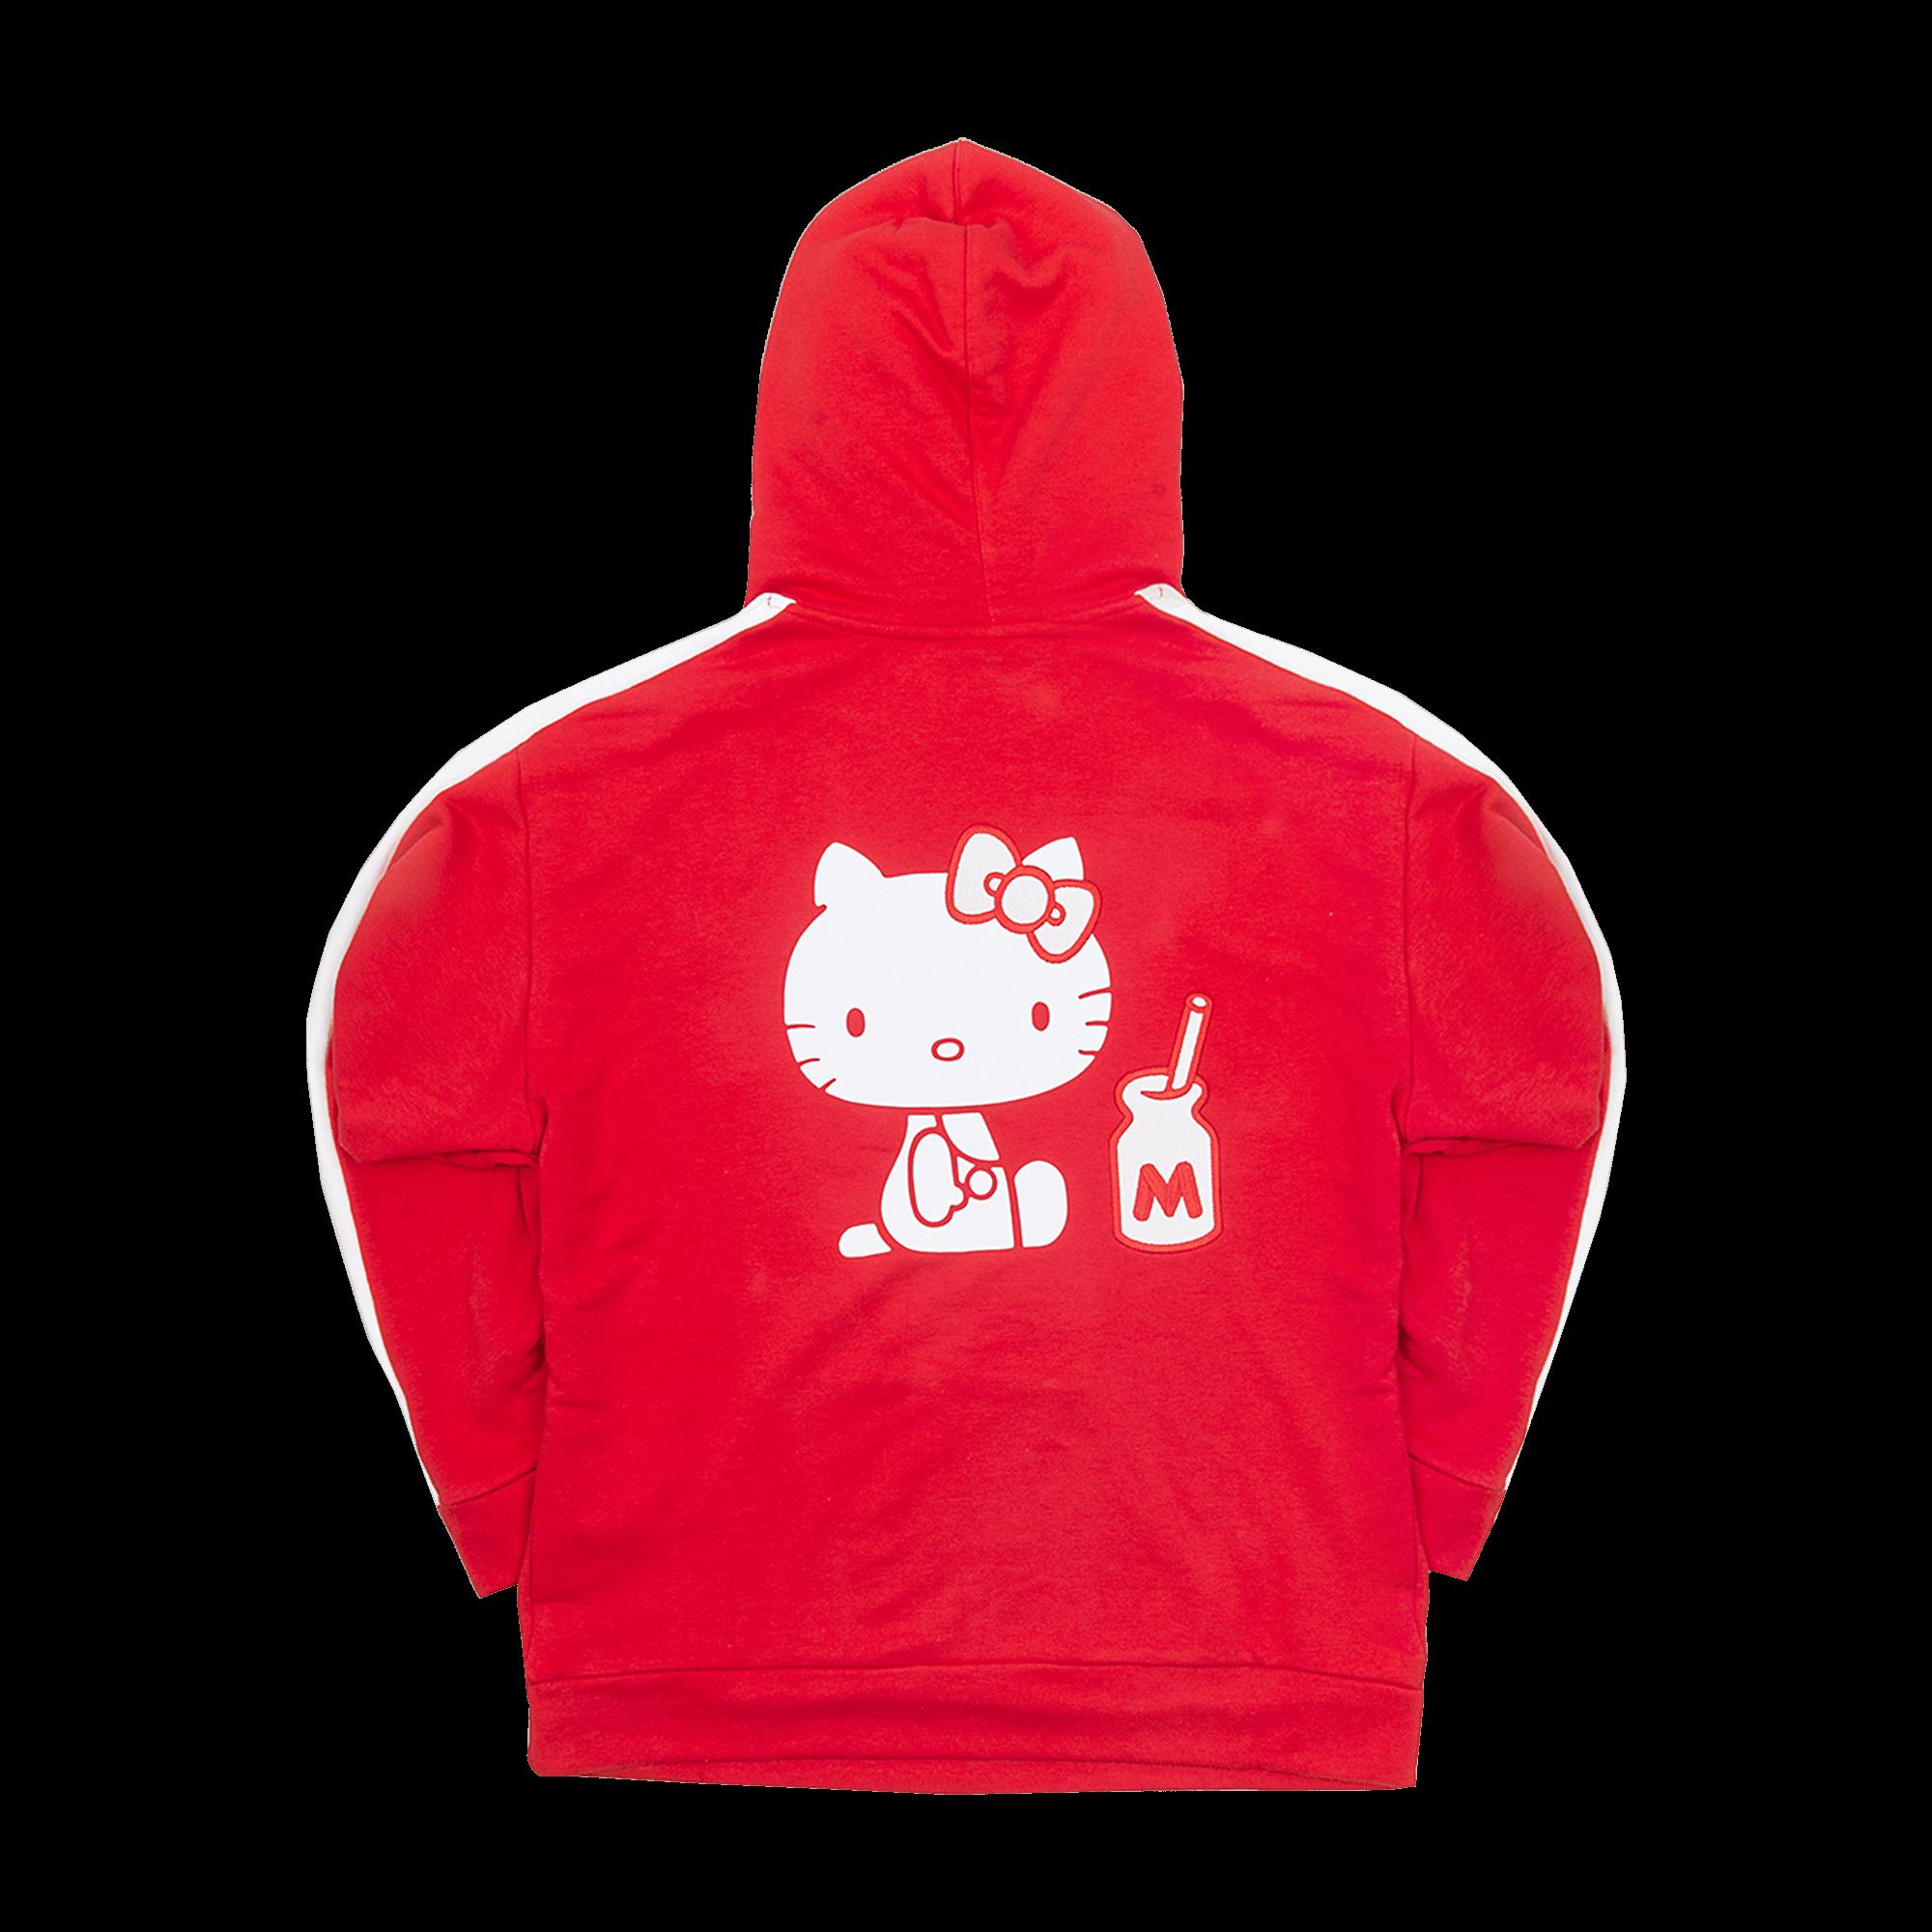 7d9a4d6e6ac6 Puma Hoodie X Hello Kitty red white - Sweatshirts